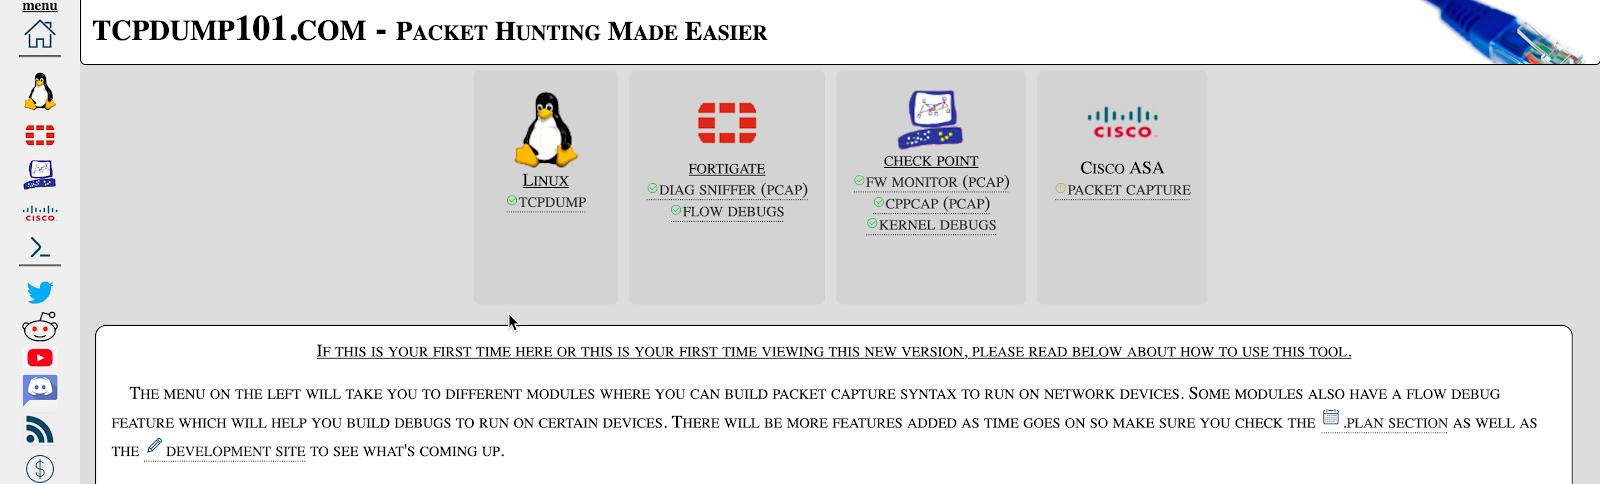 Screenshot of TCPDump 101's landing page